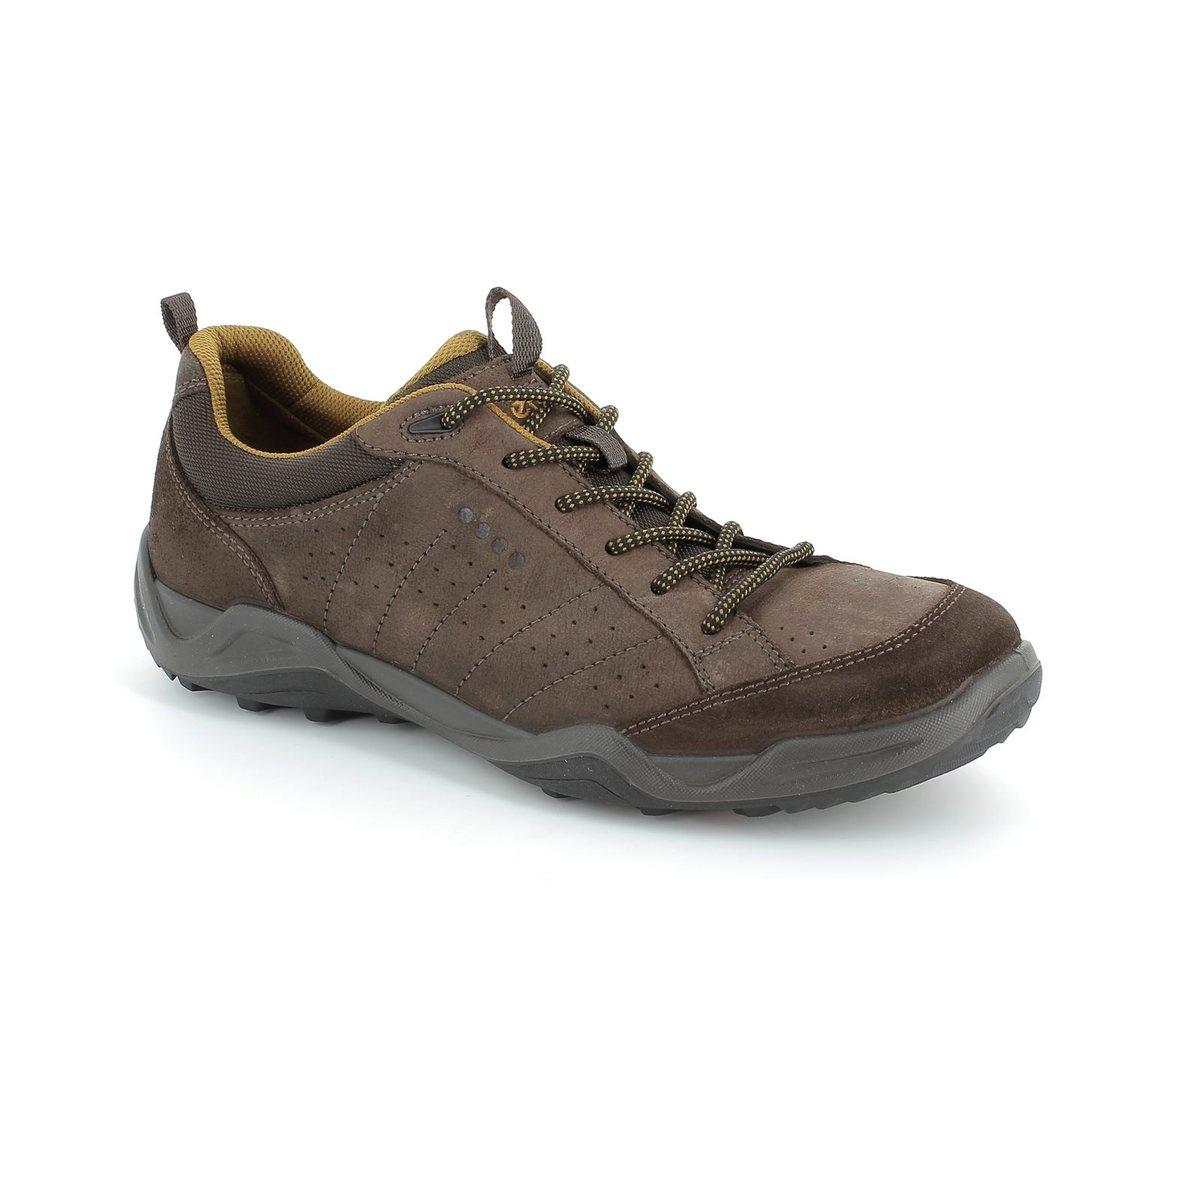 ecco sierrat 834504 58632 brown multi casual shoes